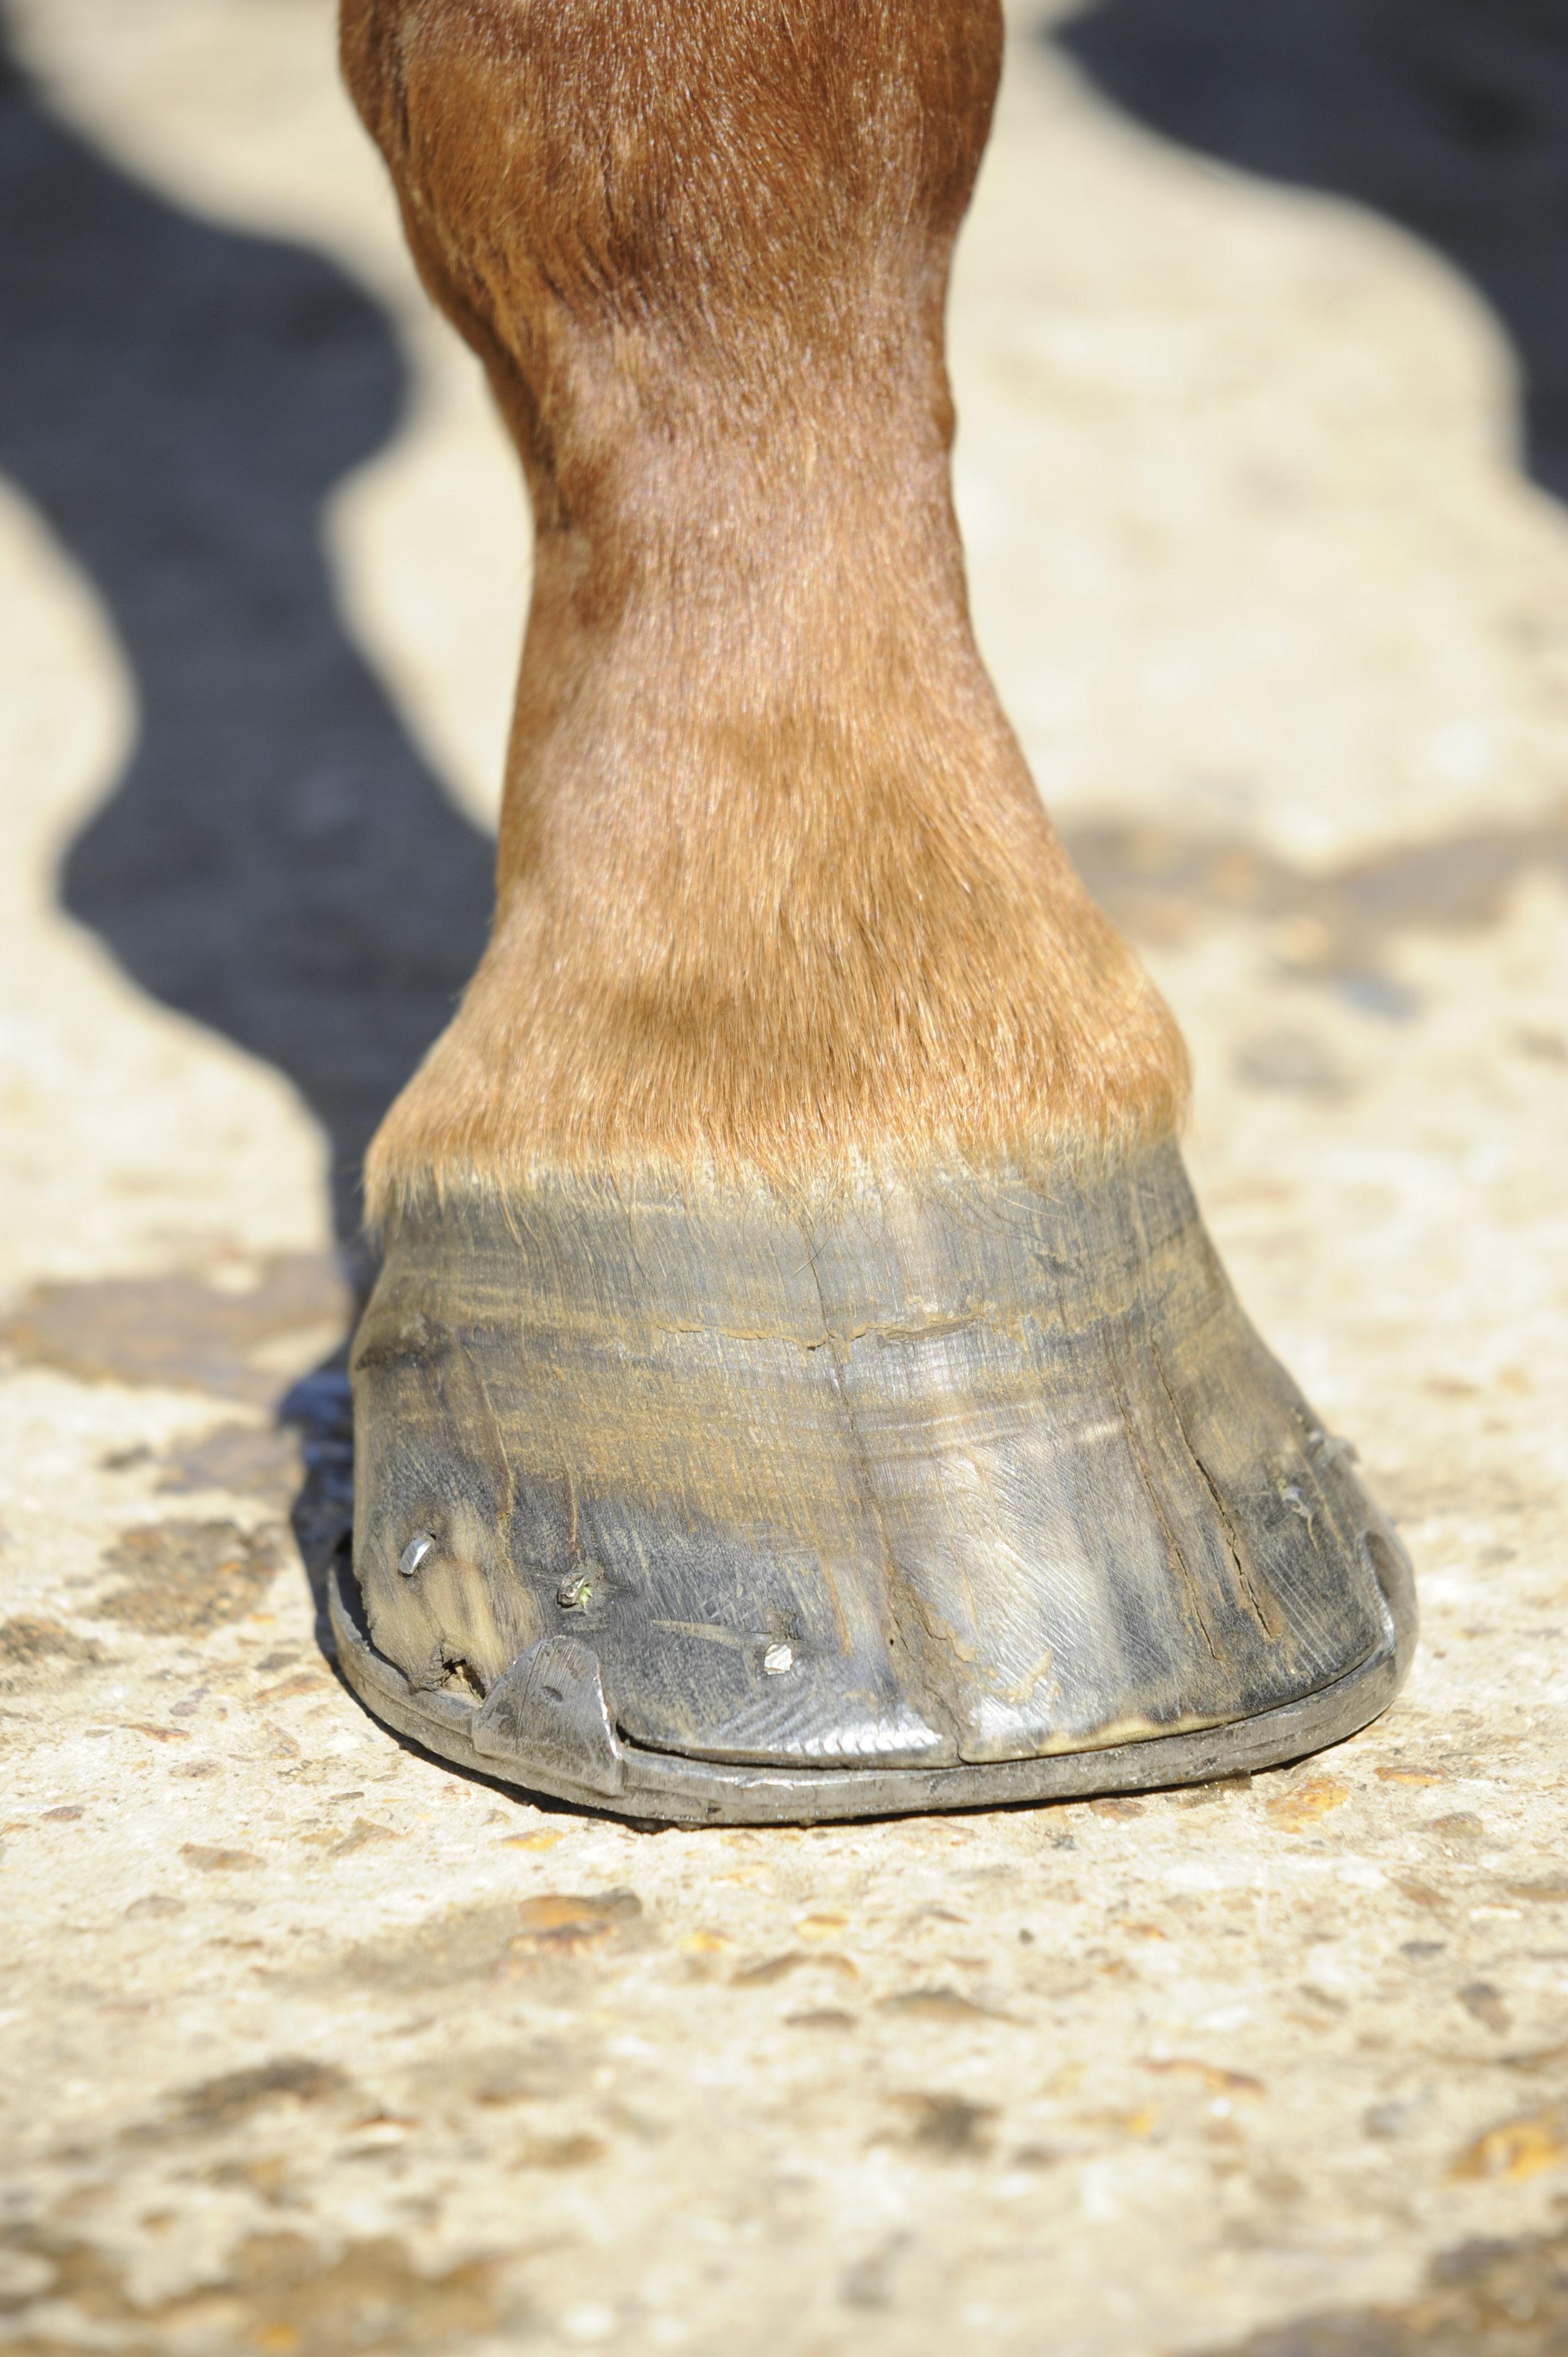 cracked hoof